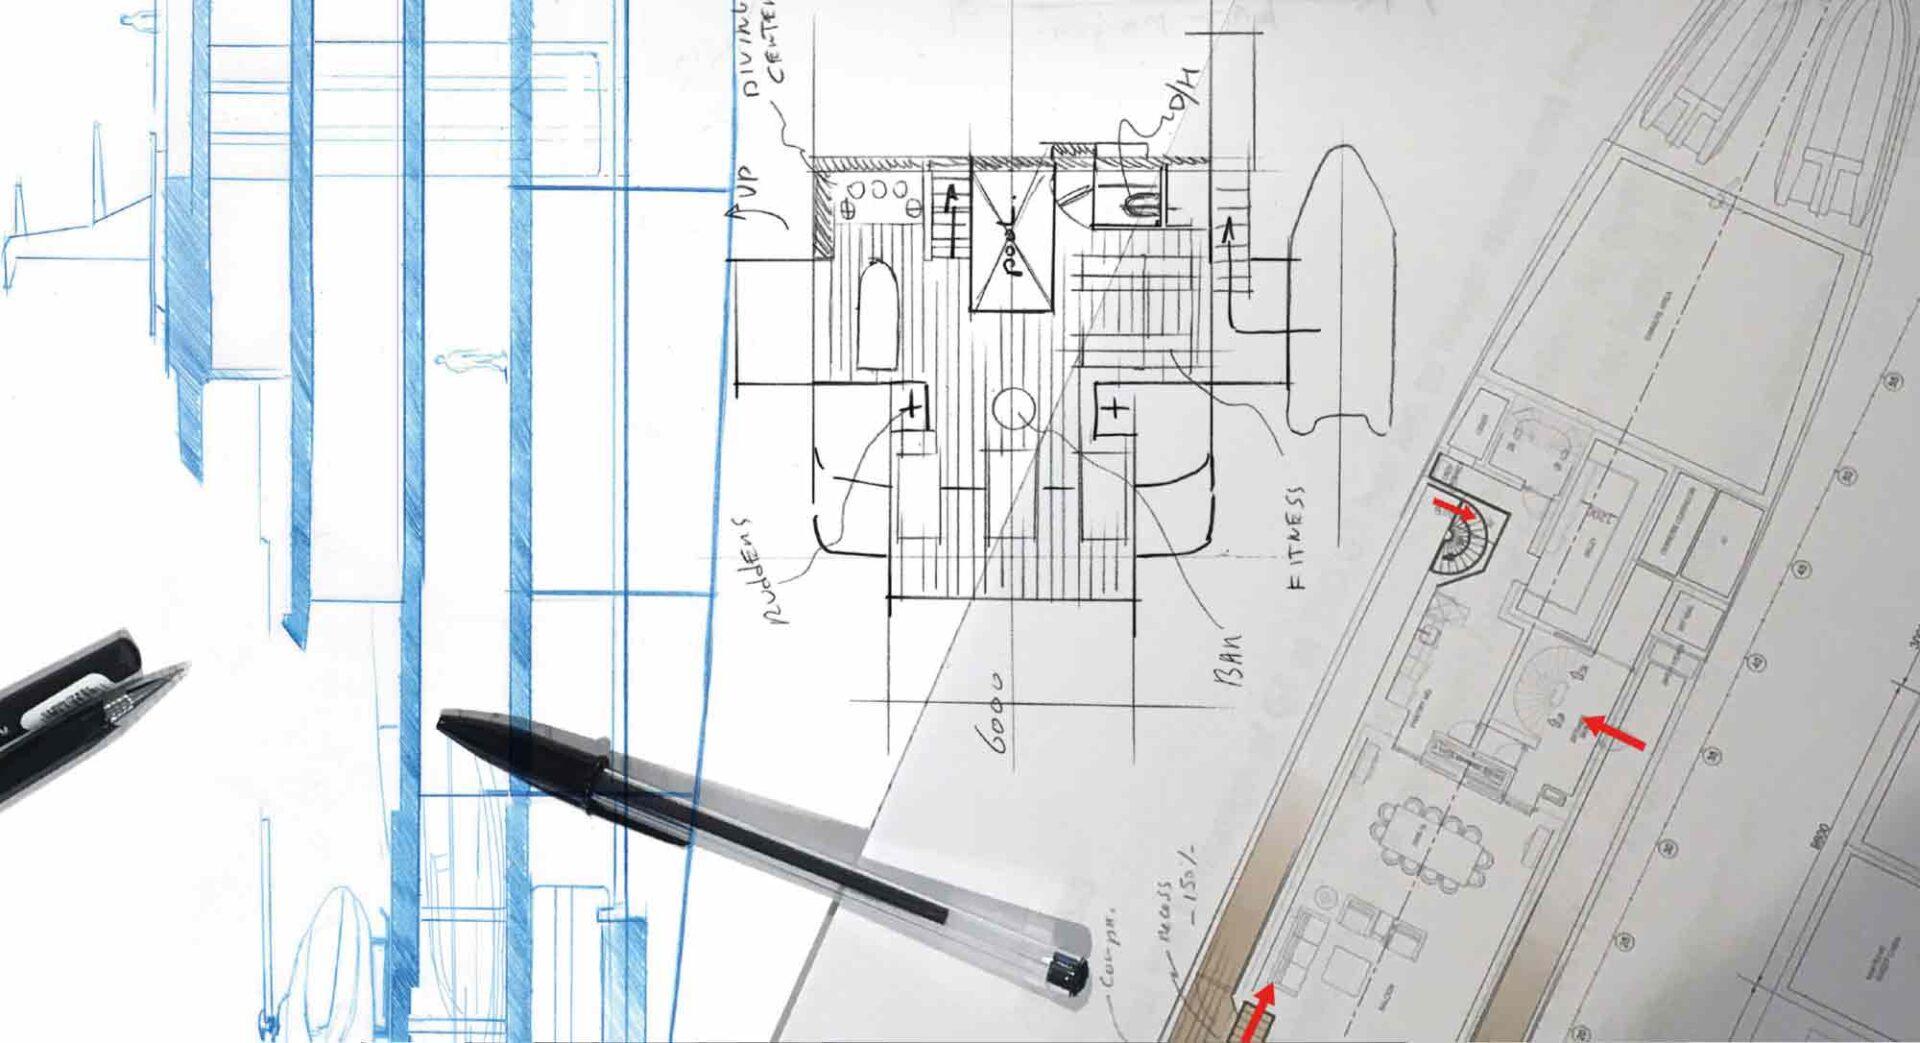 sustainable superyacht design paper